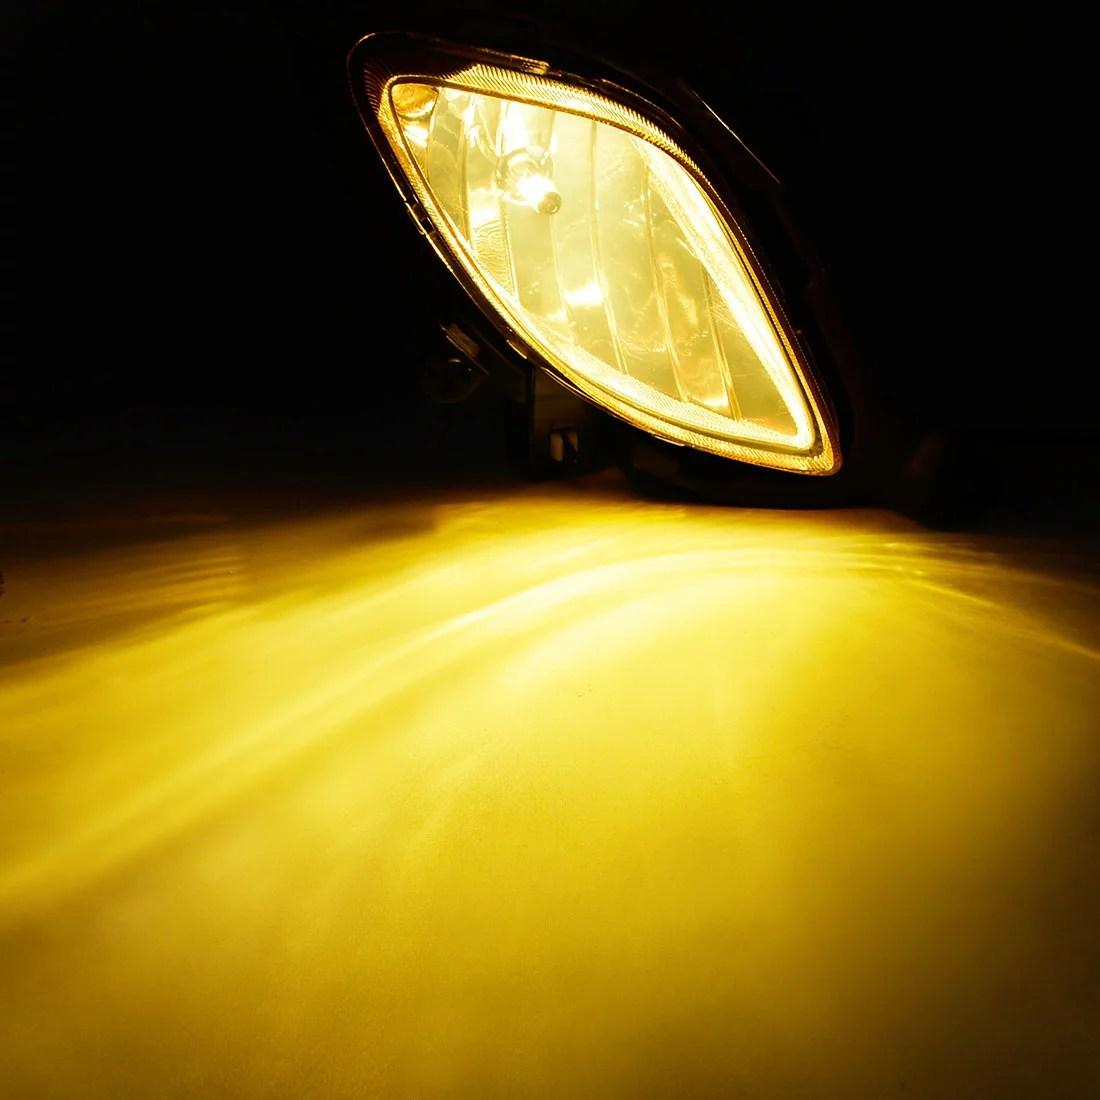 hight resolution of for 2010 2012 hyundai genesis coupe yellow bumper fog light lamp w wiring switch walmart com